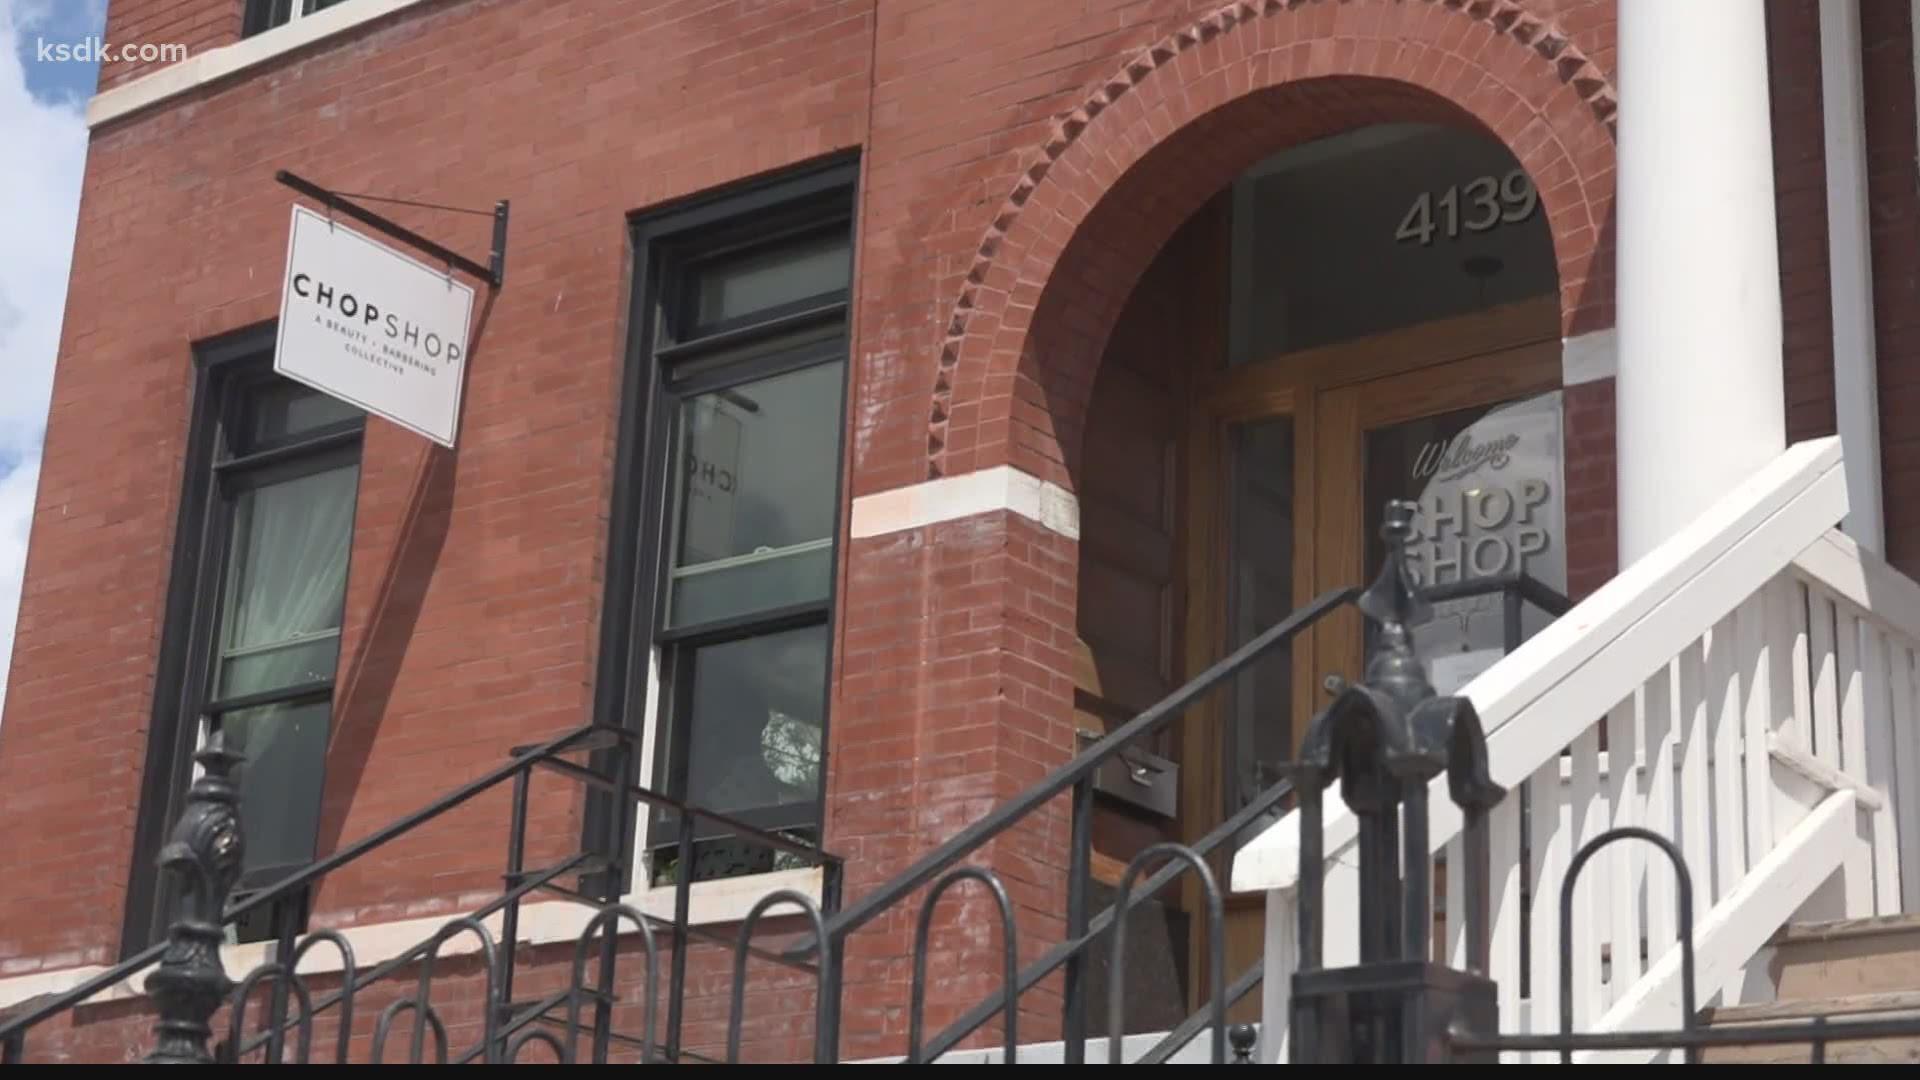 St. Louis business backlash for face mask mandate | wqad.com